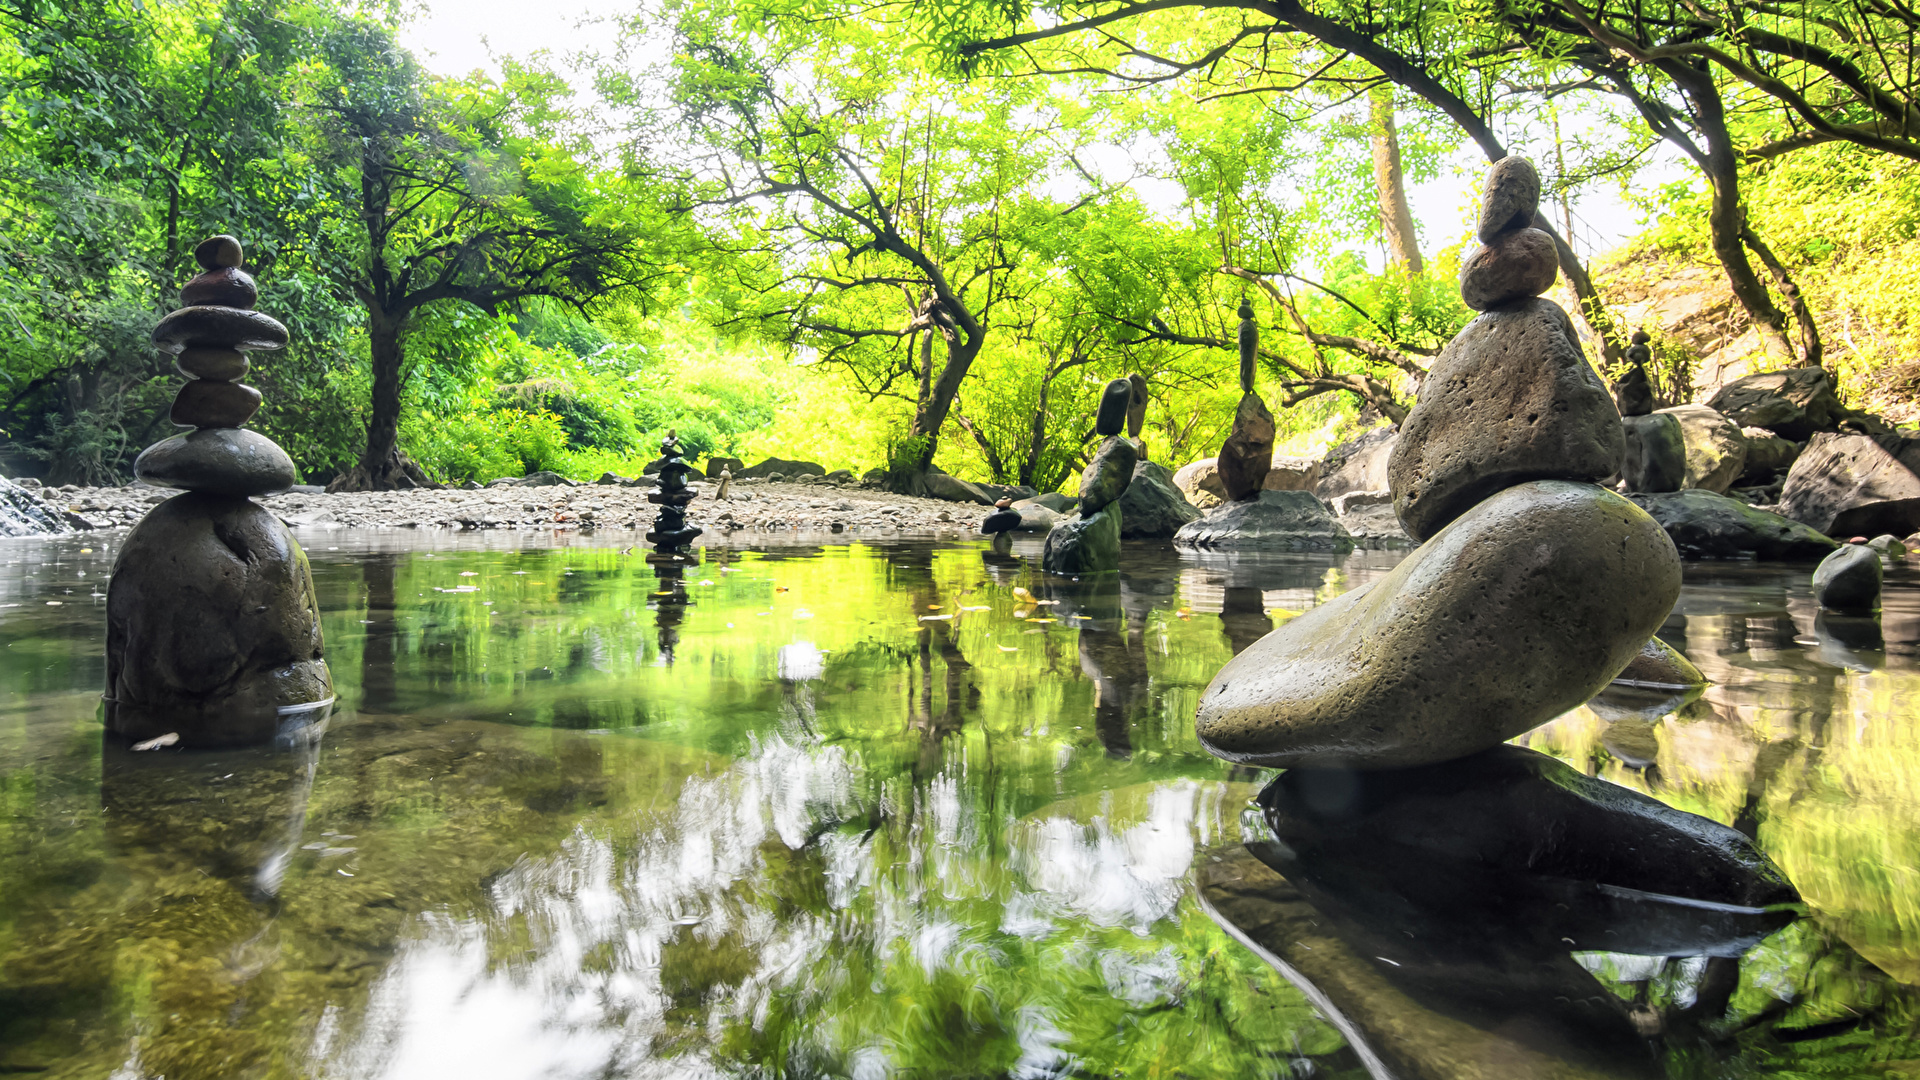 Картинка Природа весенние Пруд Парки Камни Скульптуры 1920x1080 Весна Камень